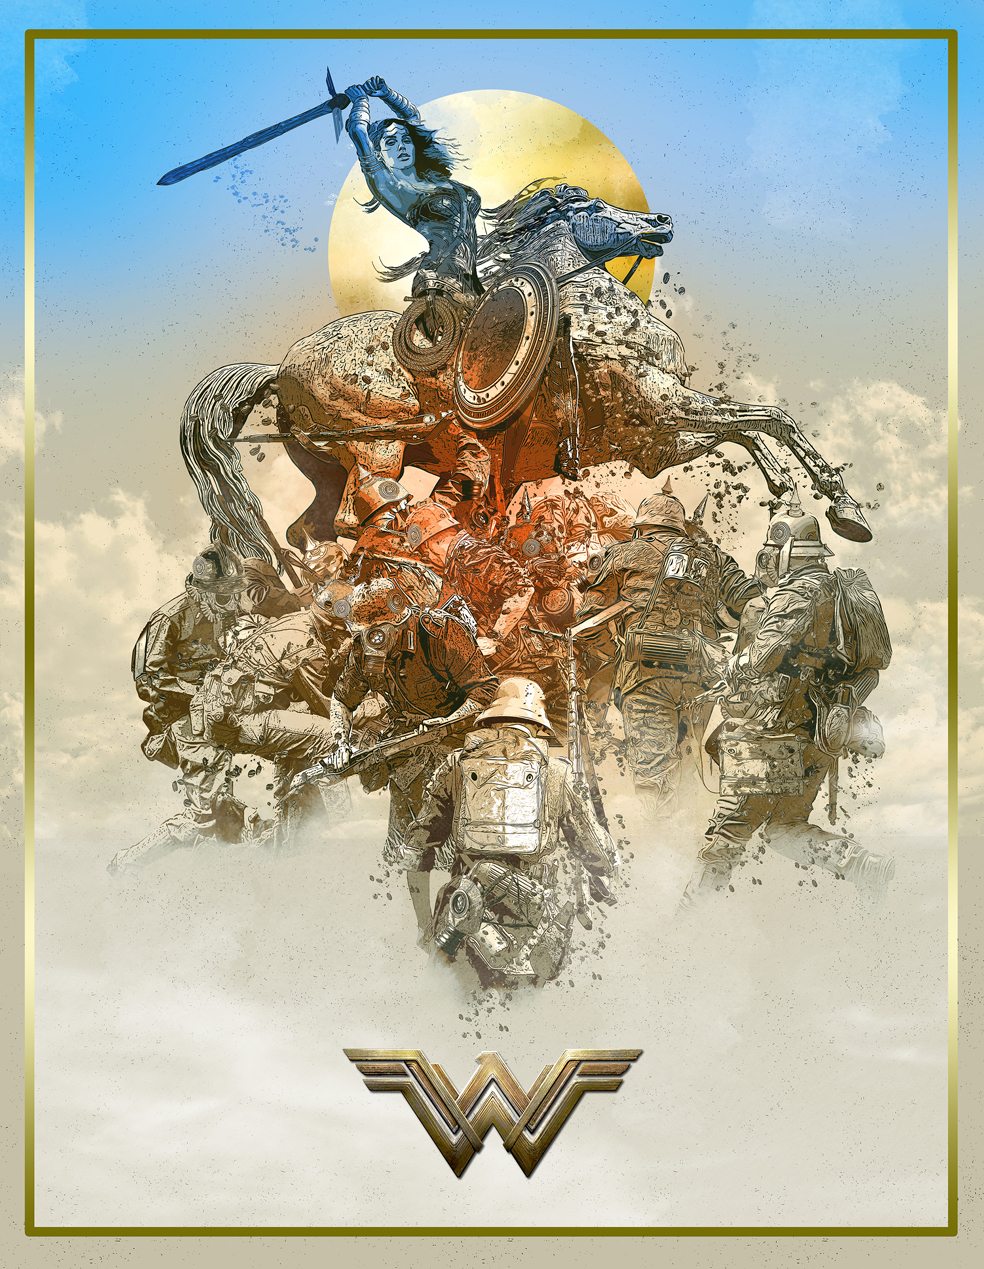 Wonder Woman Poster-posse1.jpg